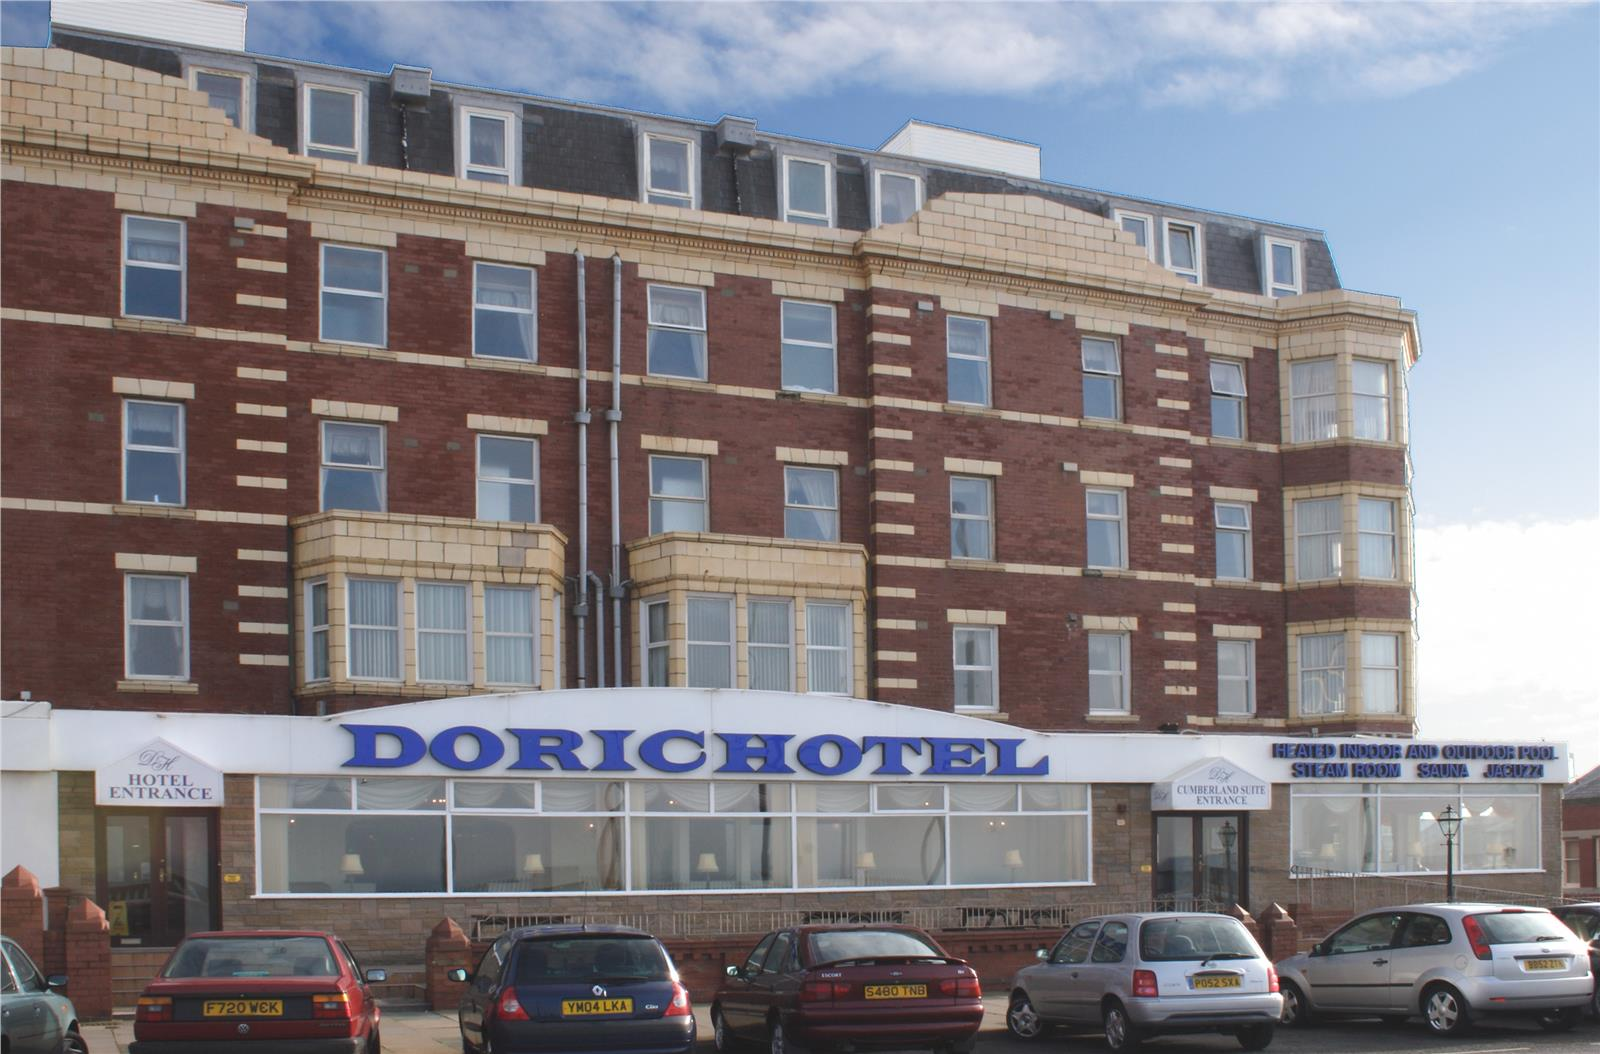 Doric Hotel, 48 - 52 Queens Promenade, Blackpool, FY2